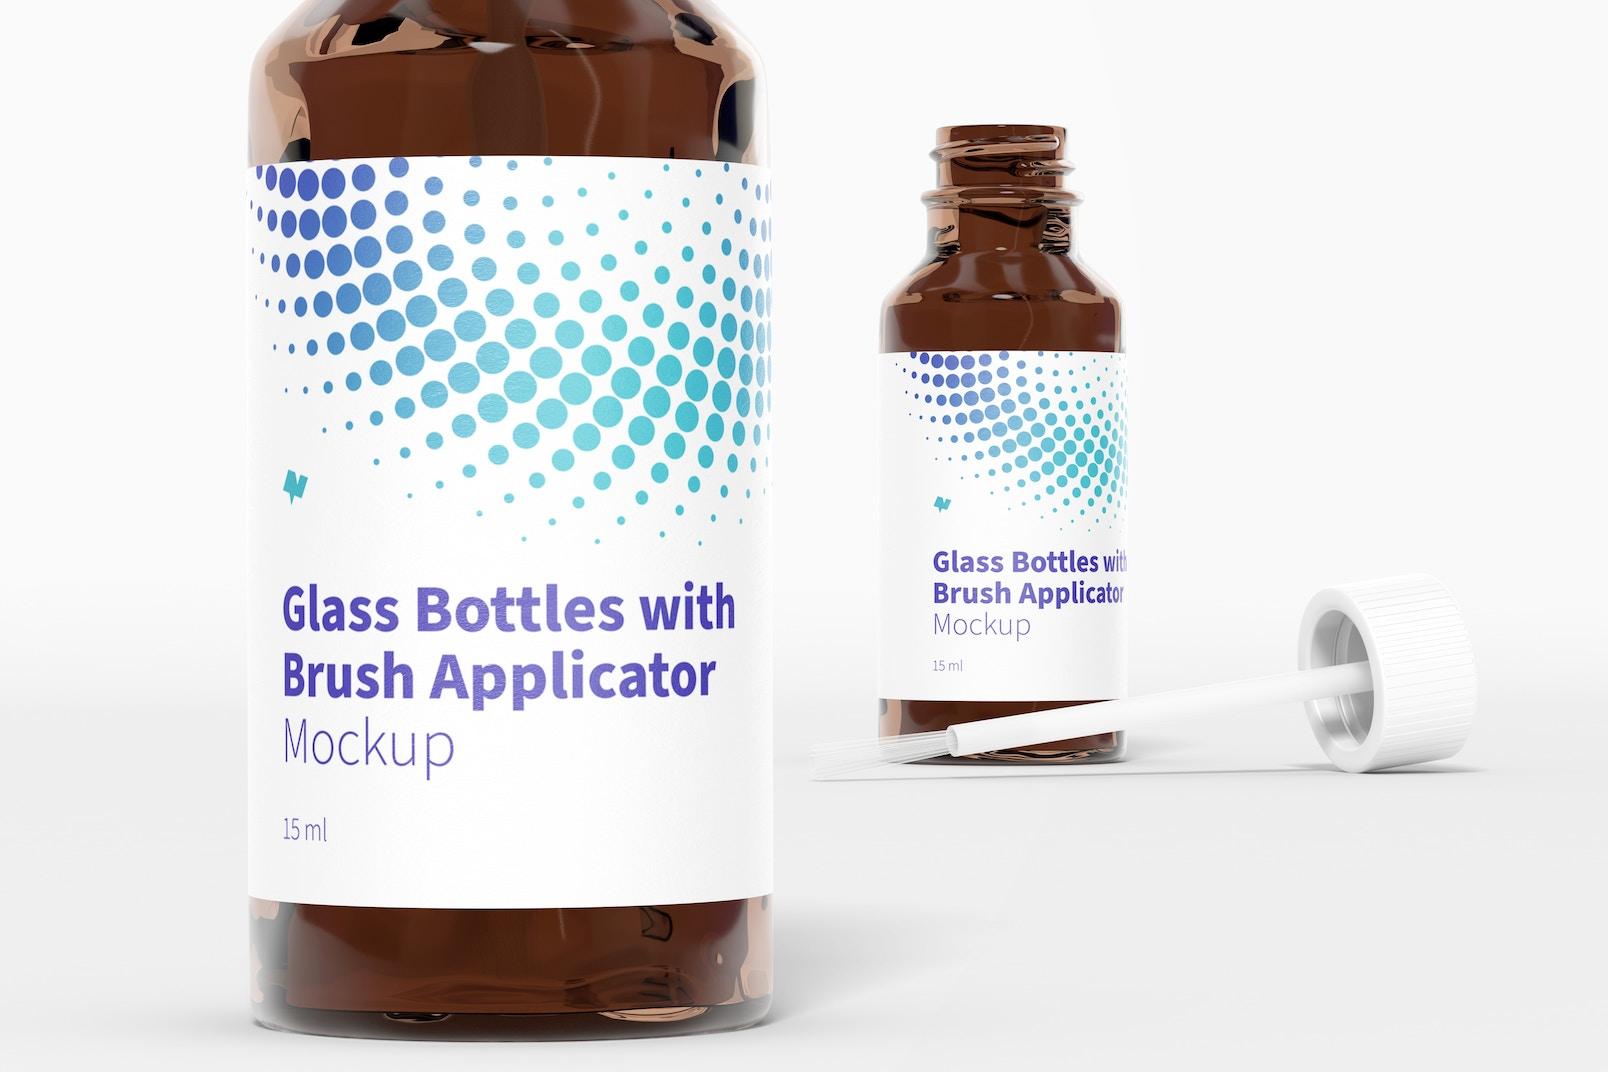 Glass Bottles with Brush Applicator Mockup, Close-Up